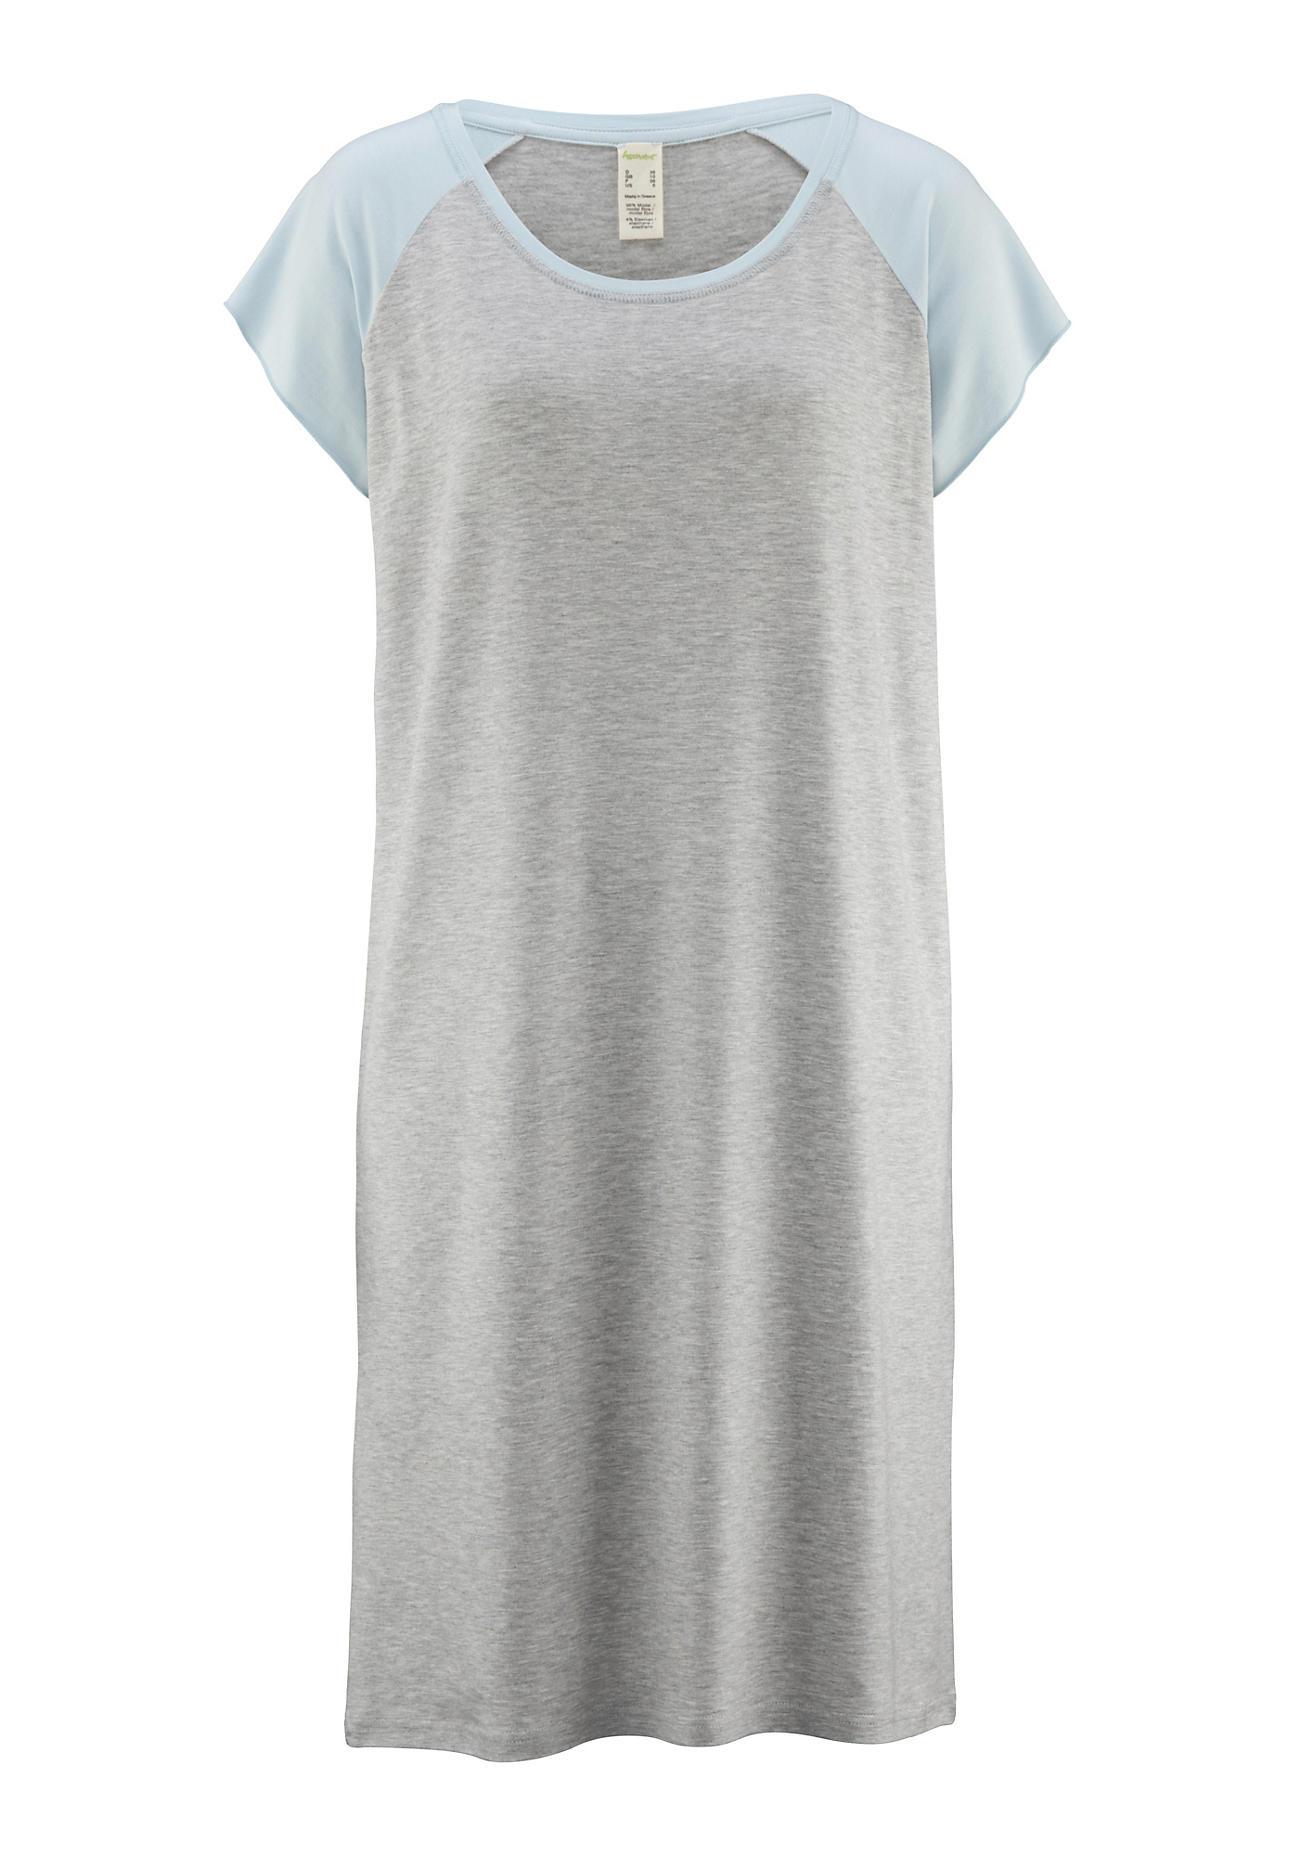 hessnatur Damen Nachthemd aus Modal – grau – Größe 38